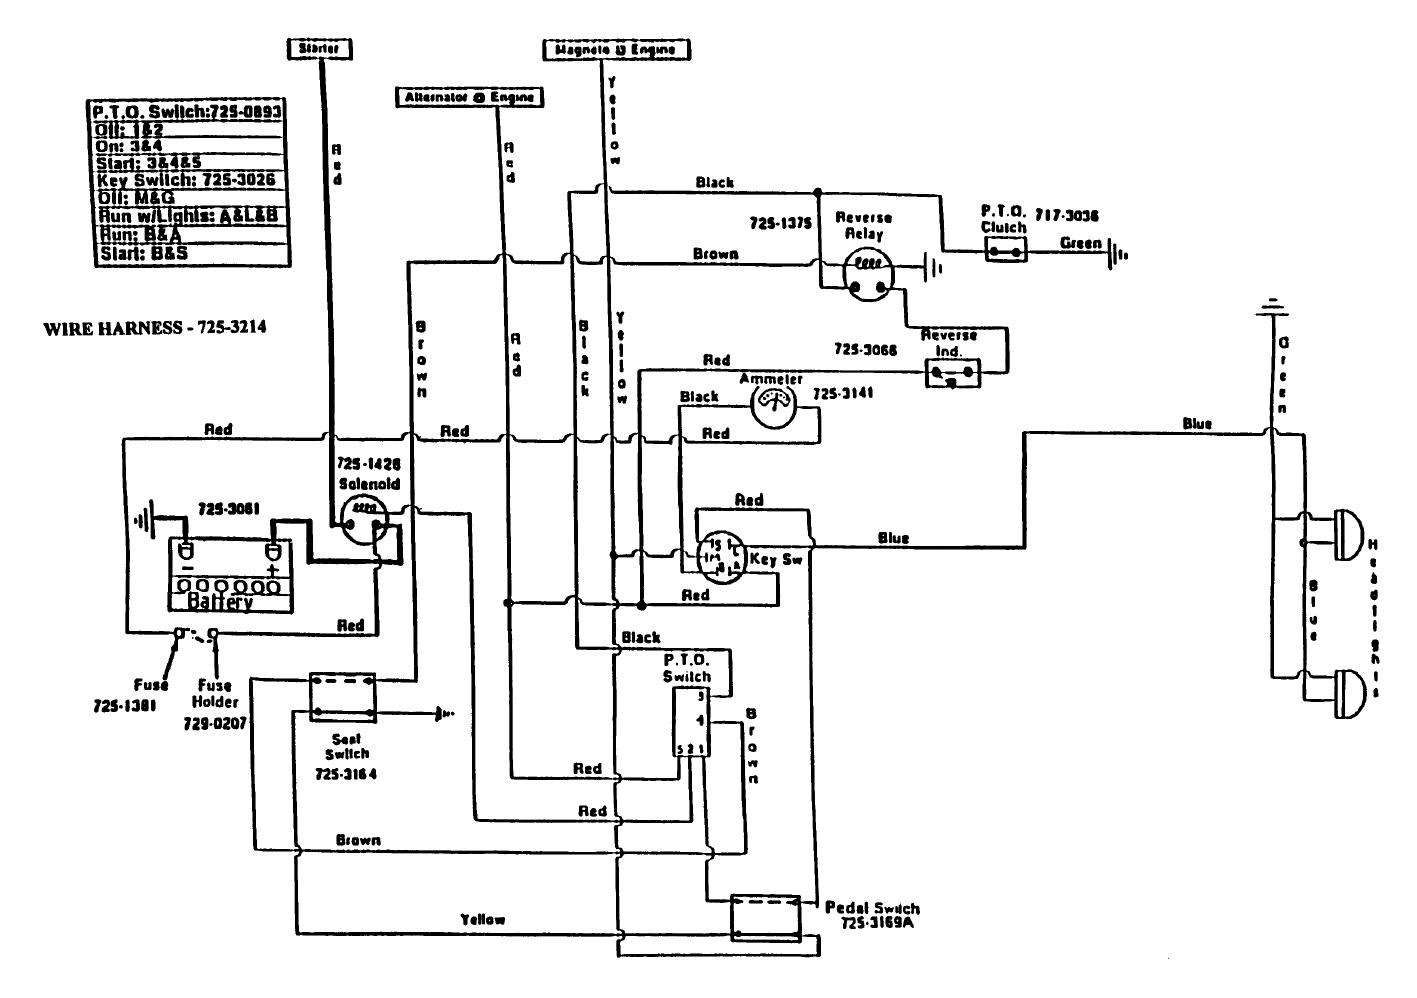 xh_5904] cub cadet 110 wiring diagram schematic wiring  pical phot scoba mohammedshrine librar wiring 101